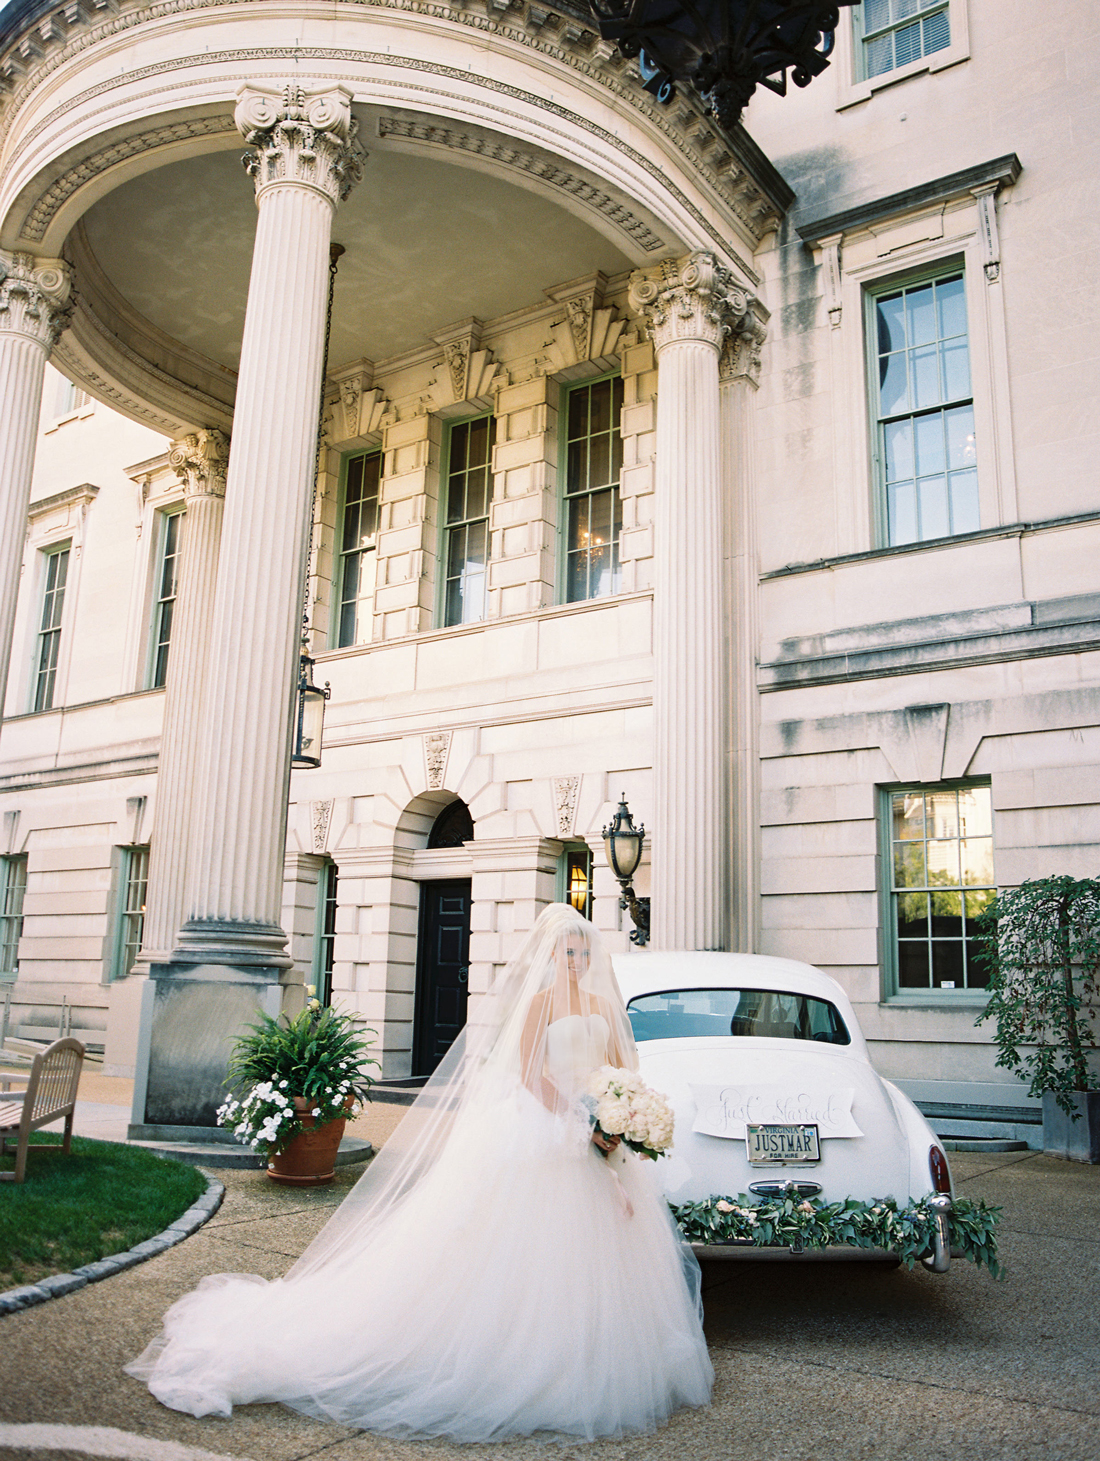 bride in wedding dress outside venue next to vintage white car